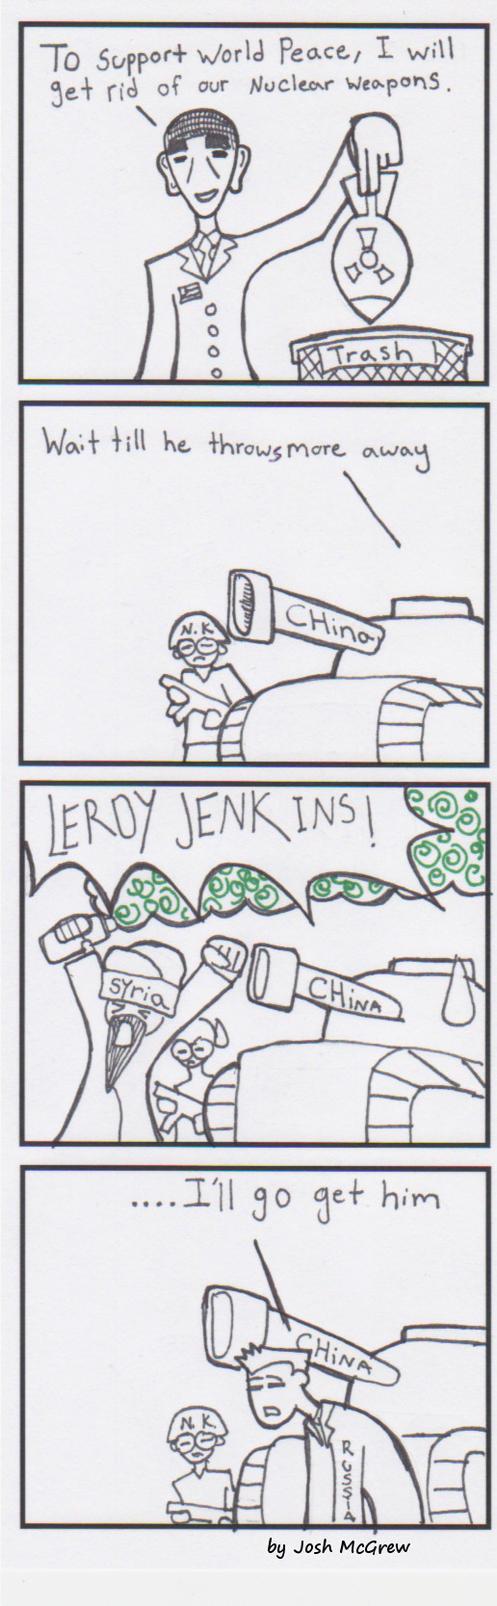 World peace to progress comic strips